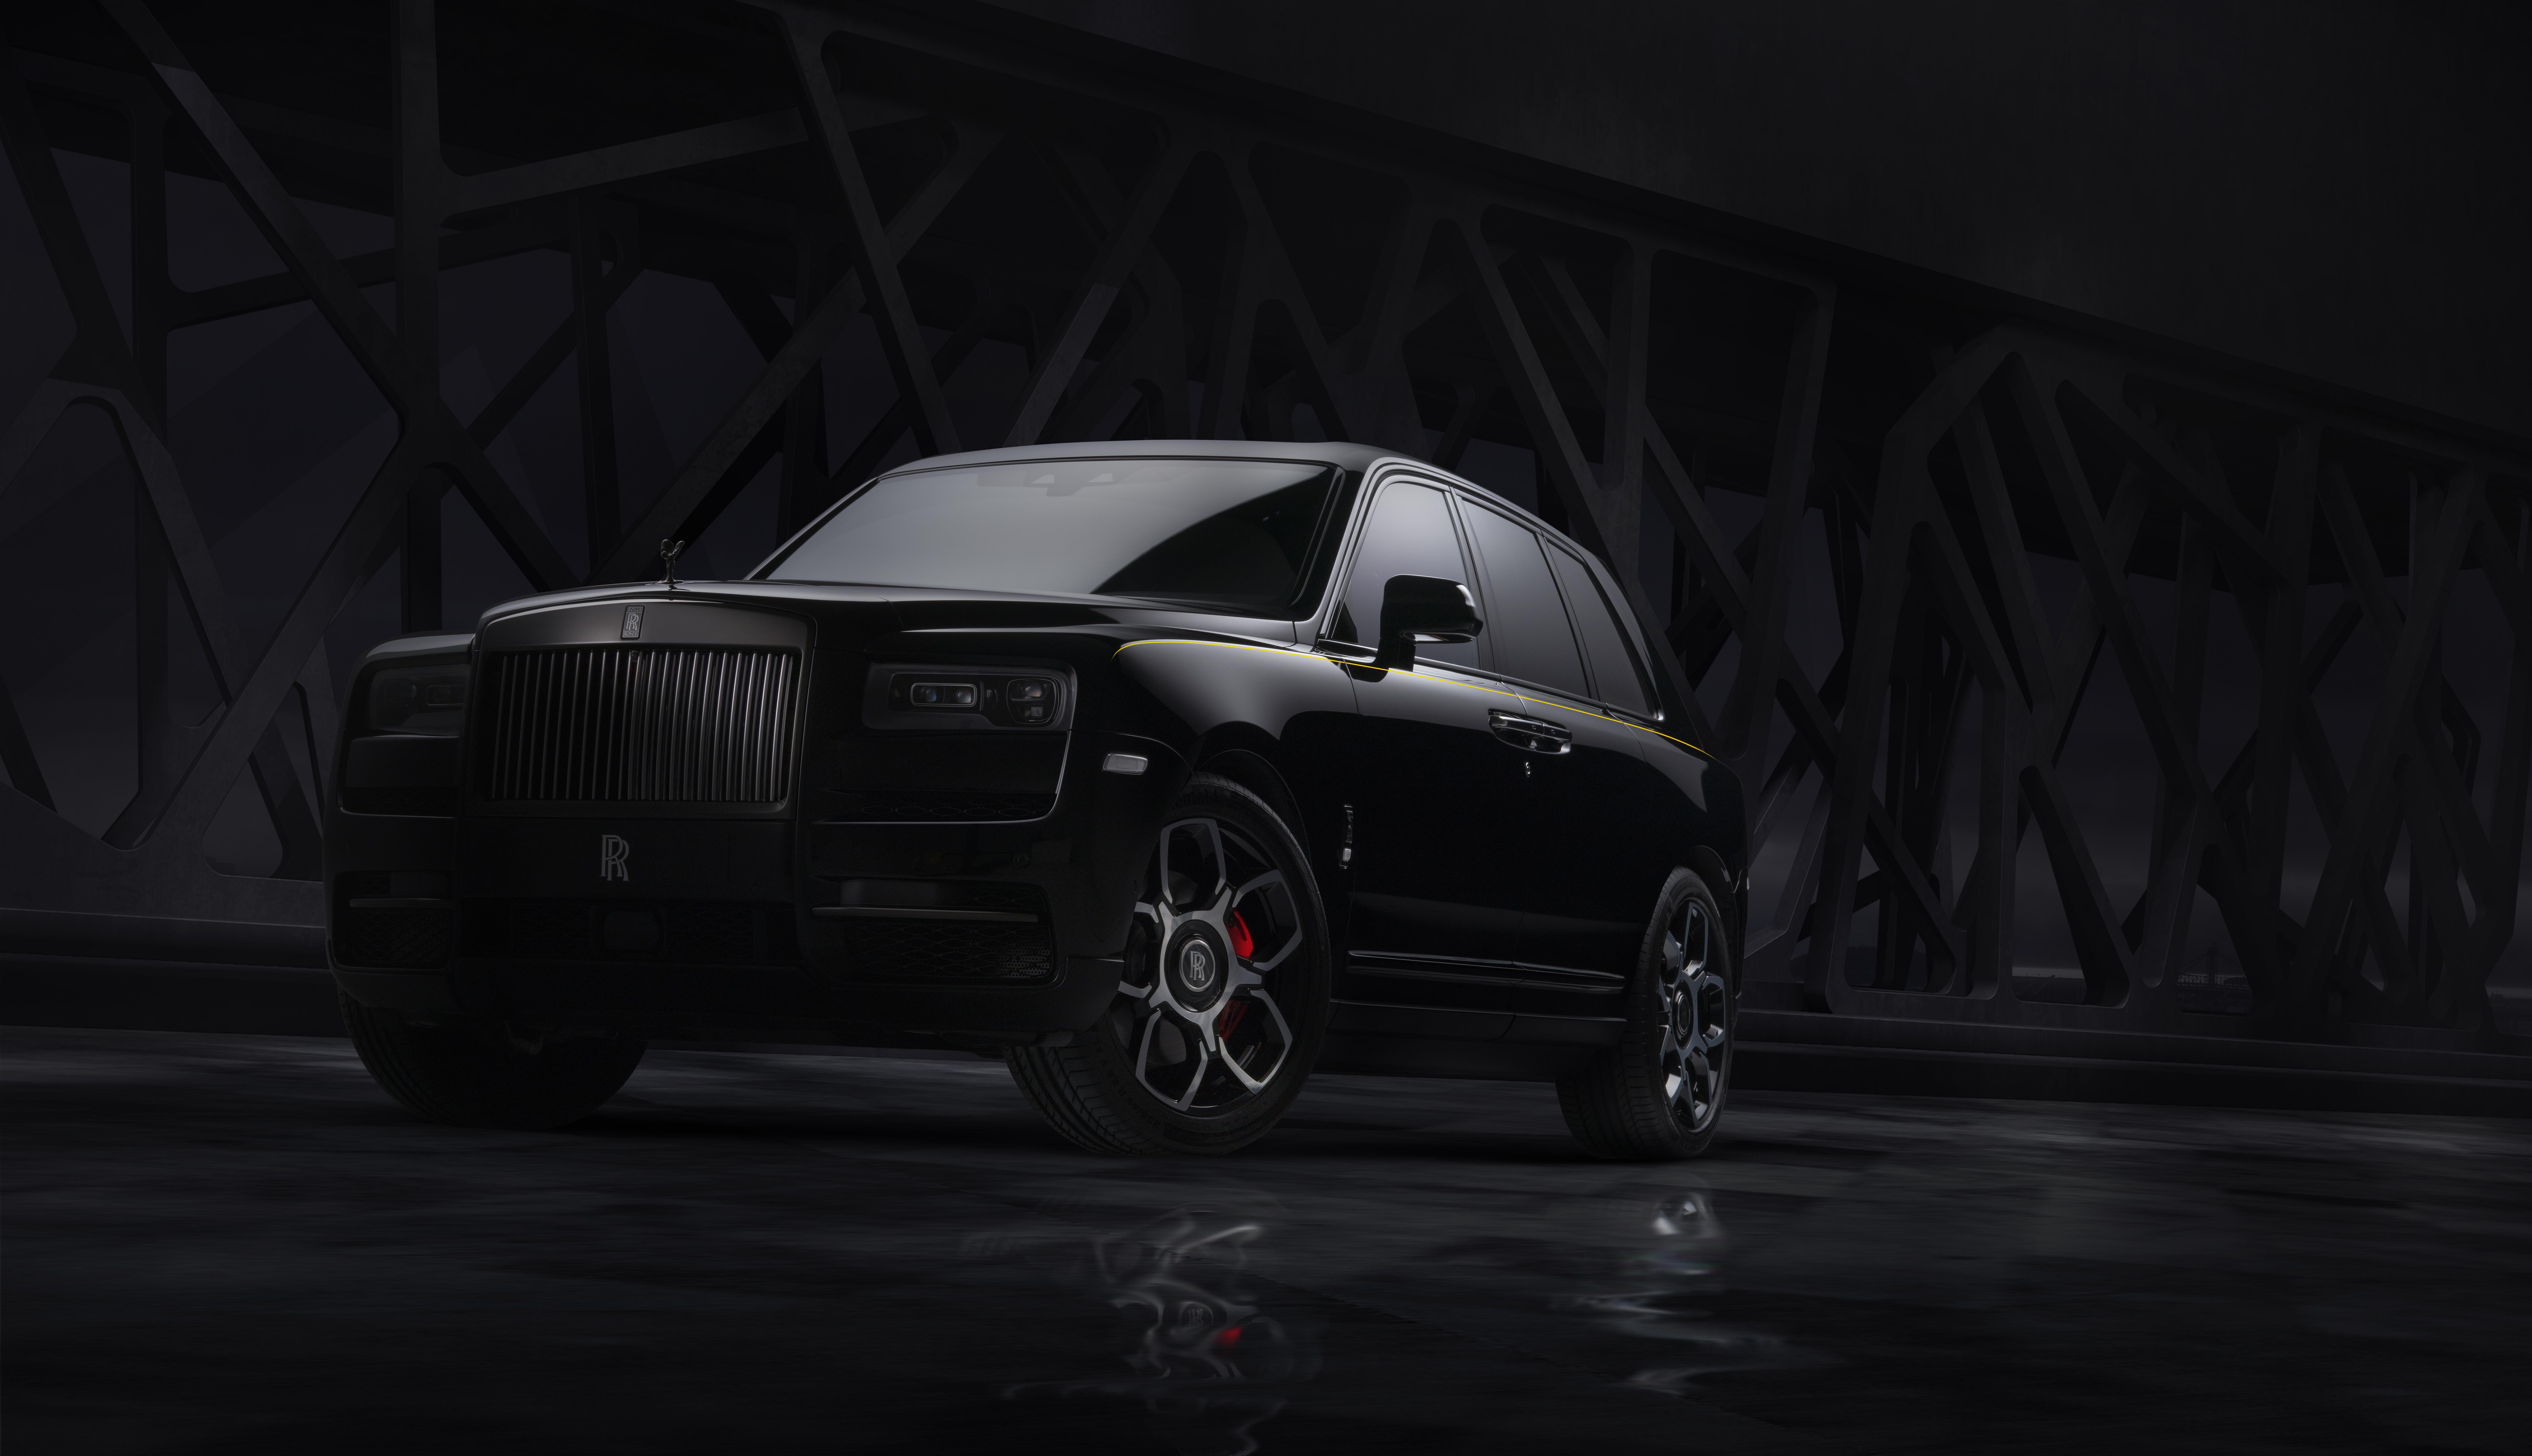 Rolls Royce Cullinan Black Badge 2019, HD Cars, 4k ...